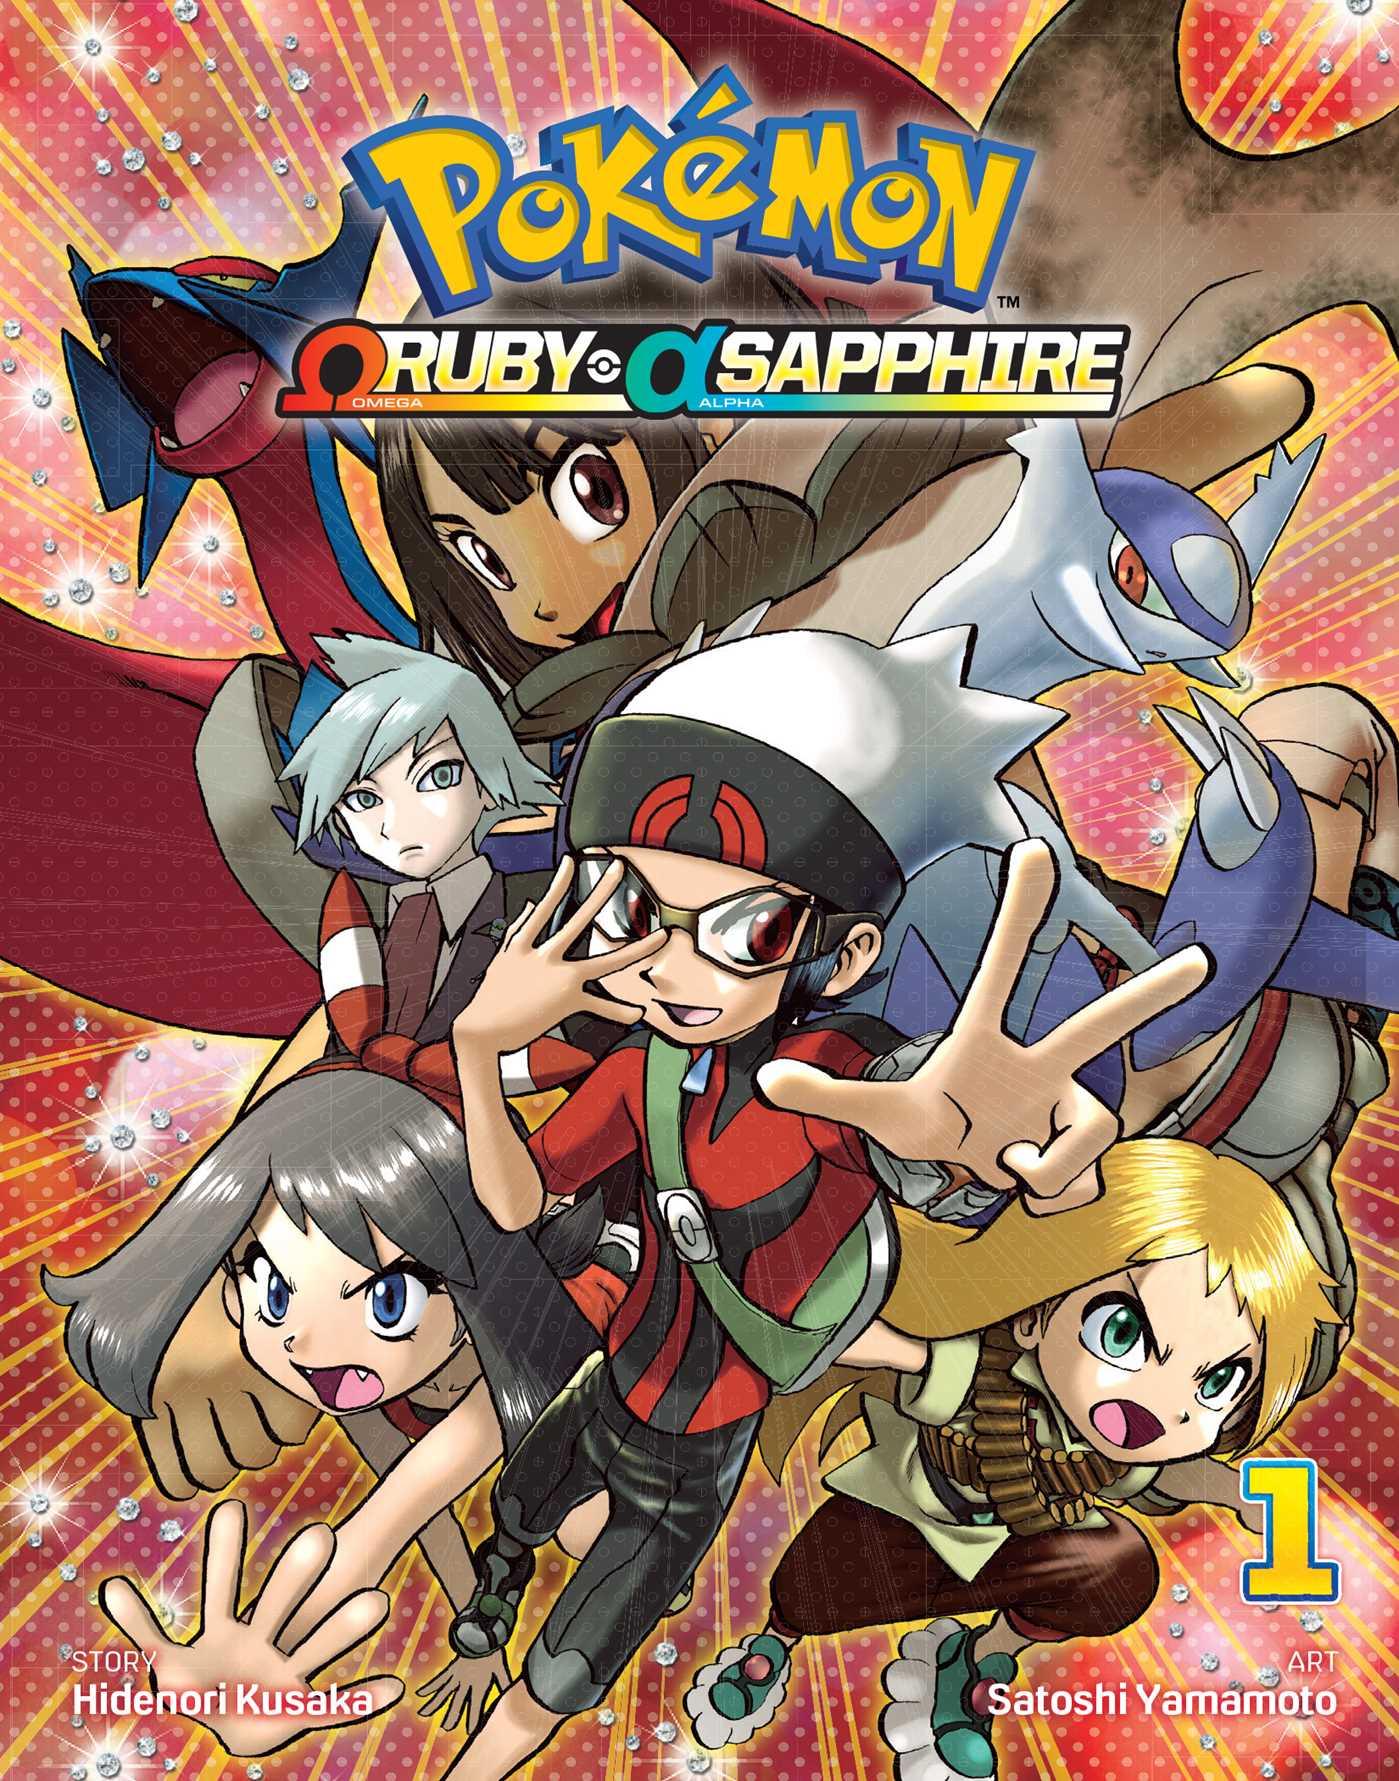 Pok mon omega ruby alpha sapphire vol 1 book by satoshi yamamoto hidenori kusaka official - Pokemon saphir pokemon legendaire ...